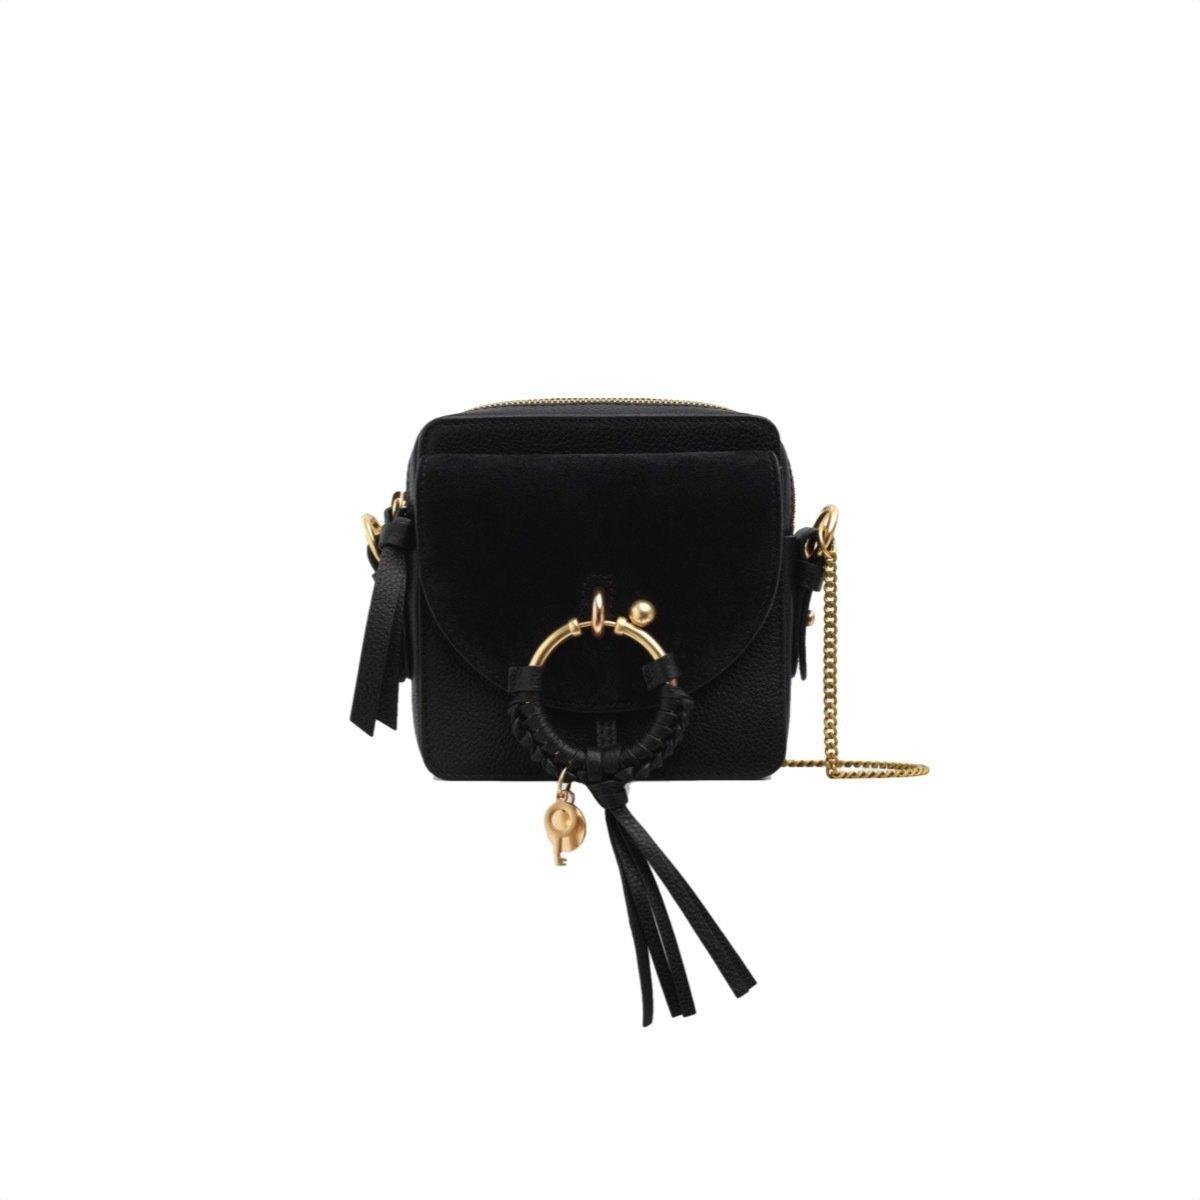 SEE BY CHLOÉ - Joan Mini Crossbody Bag - Black